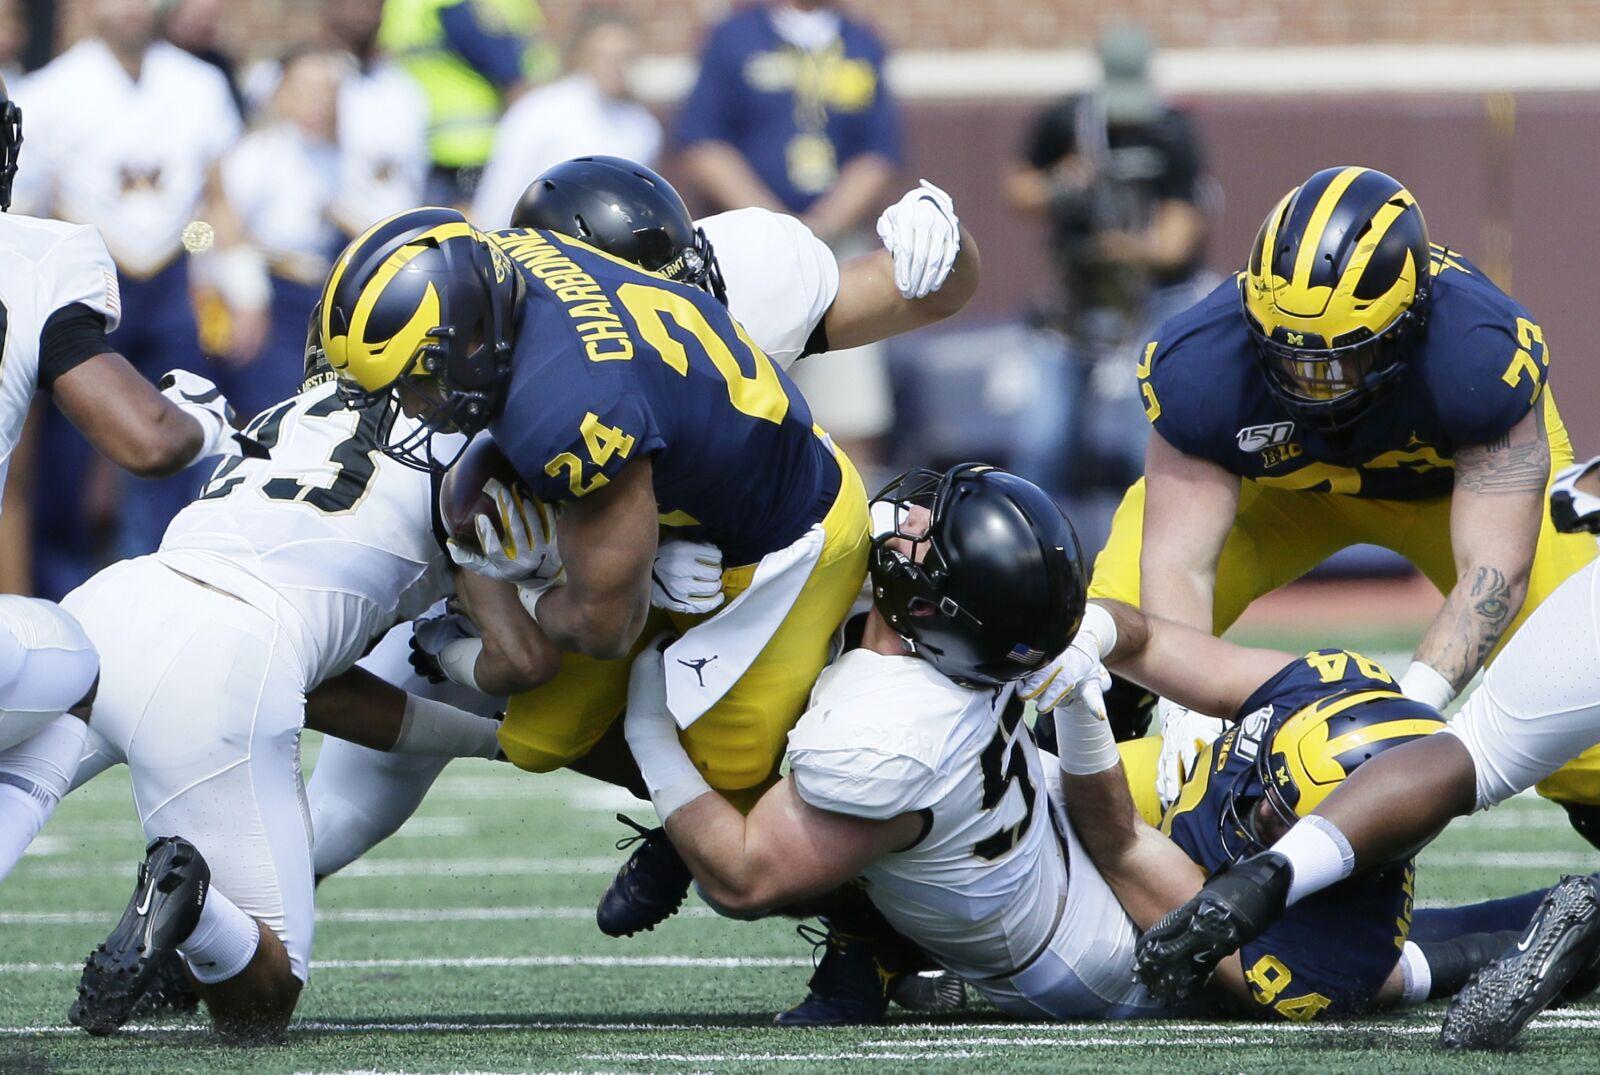 Michigan Football: Rumors swirl about an injury to Zach Charbonnet